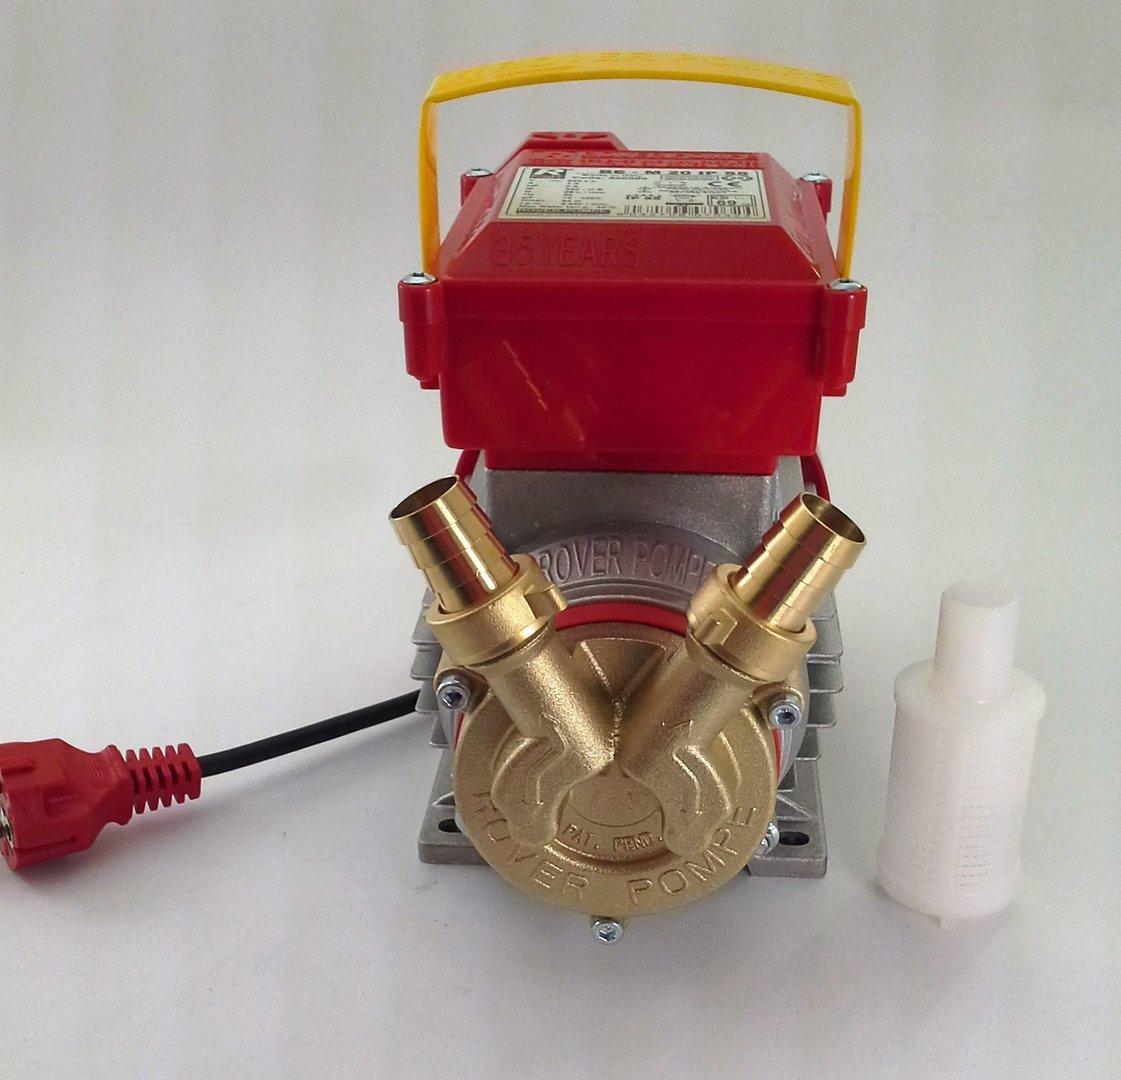 Rover Pompe Bem 20 Ip 55 Diesel Code 500000 Bombas Y Motores